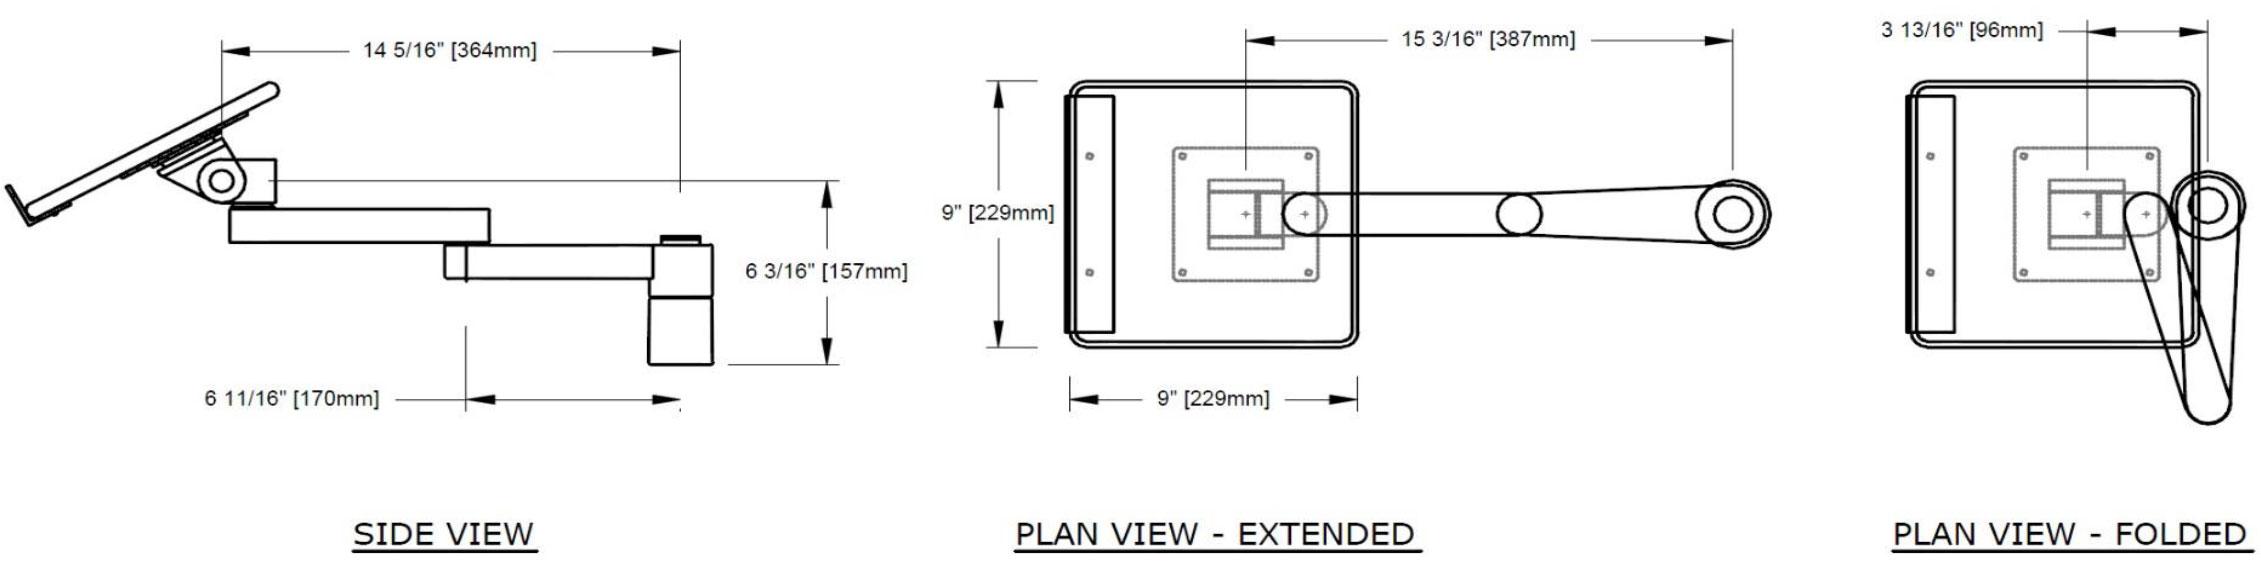 T-Phone Specs